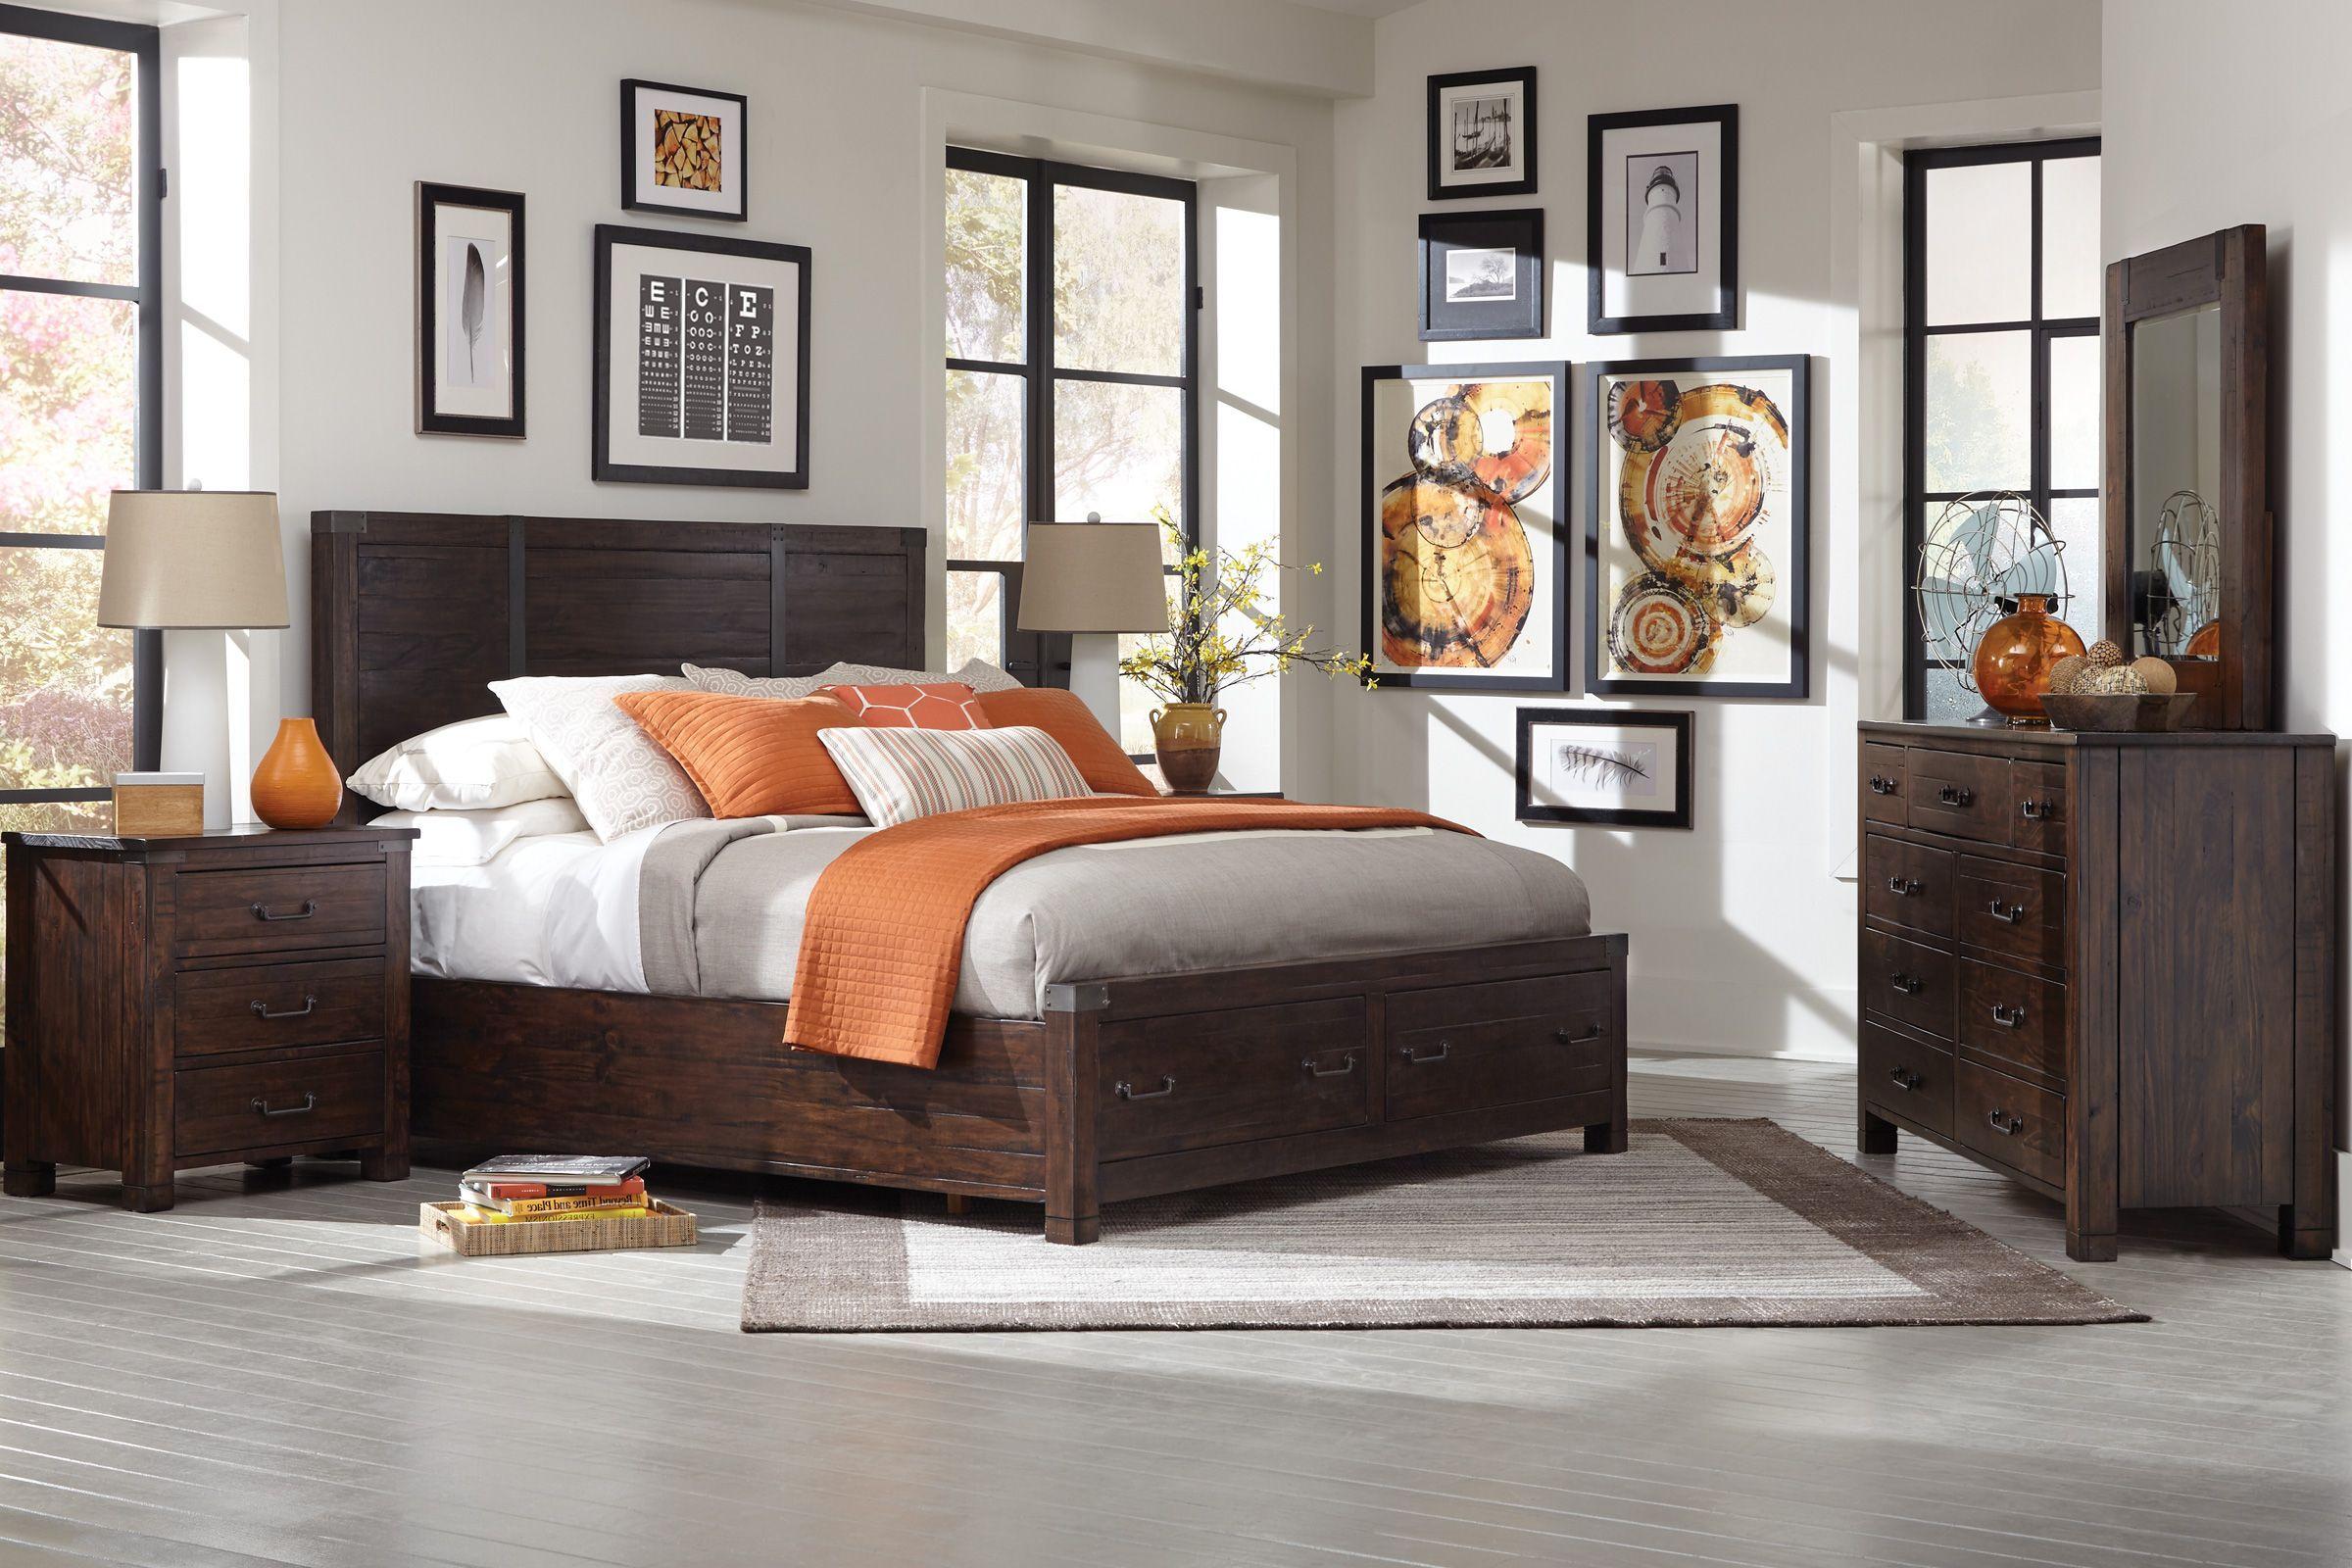 51+ Industrial King Bedroom Set New HD